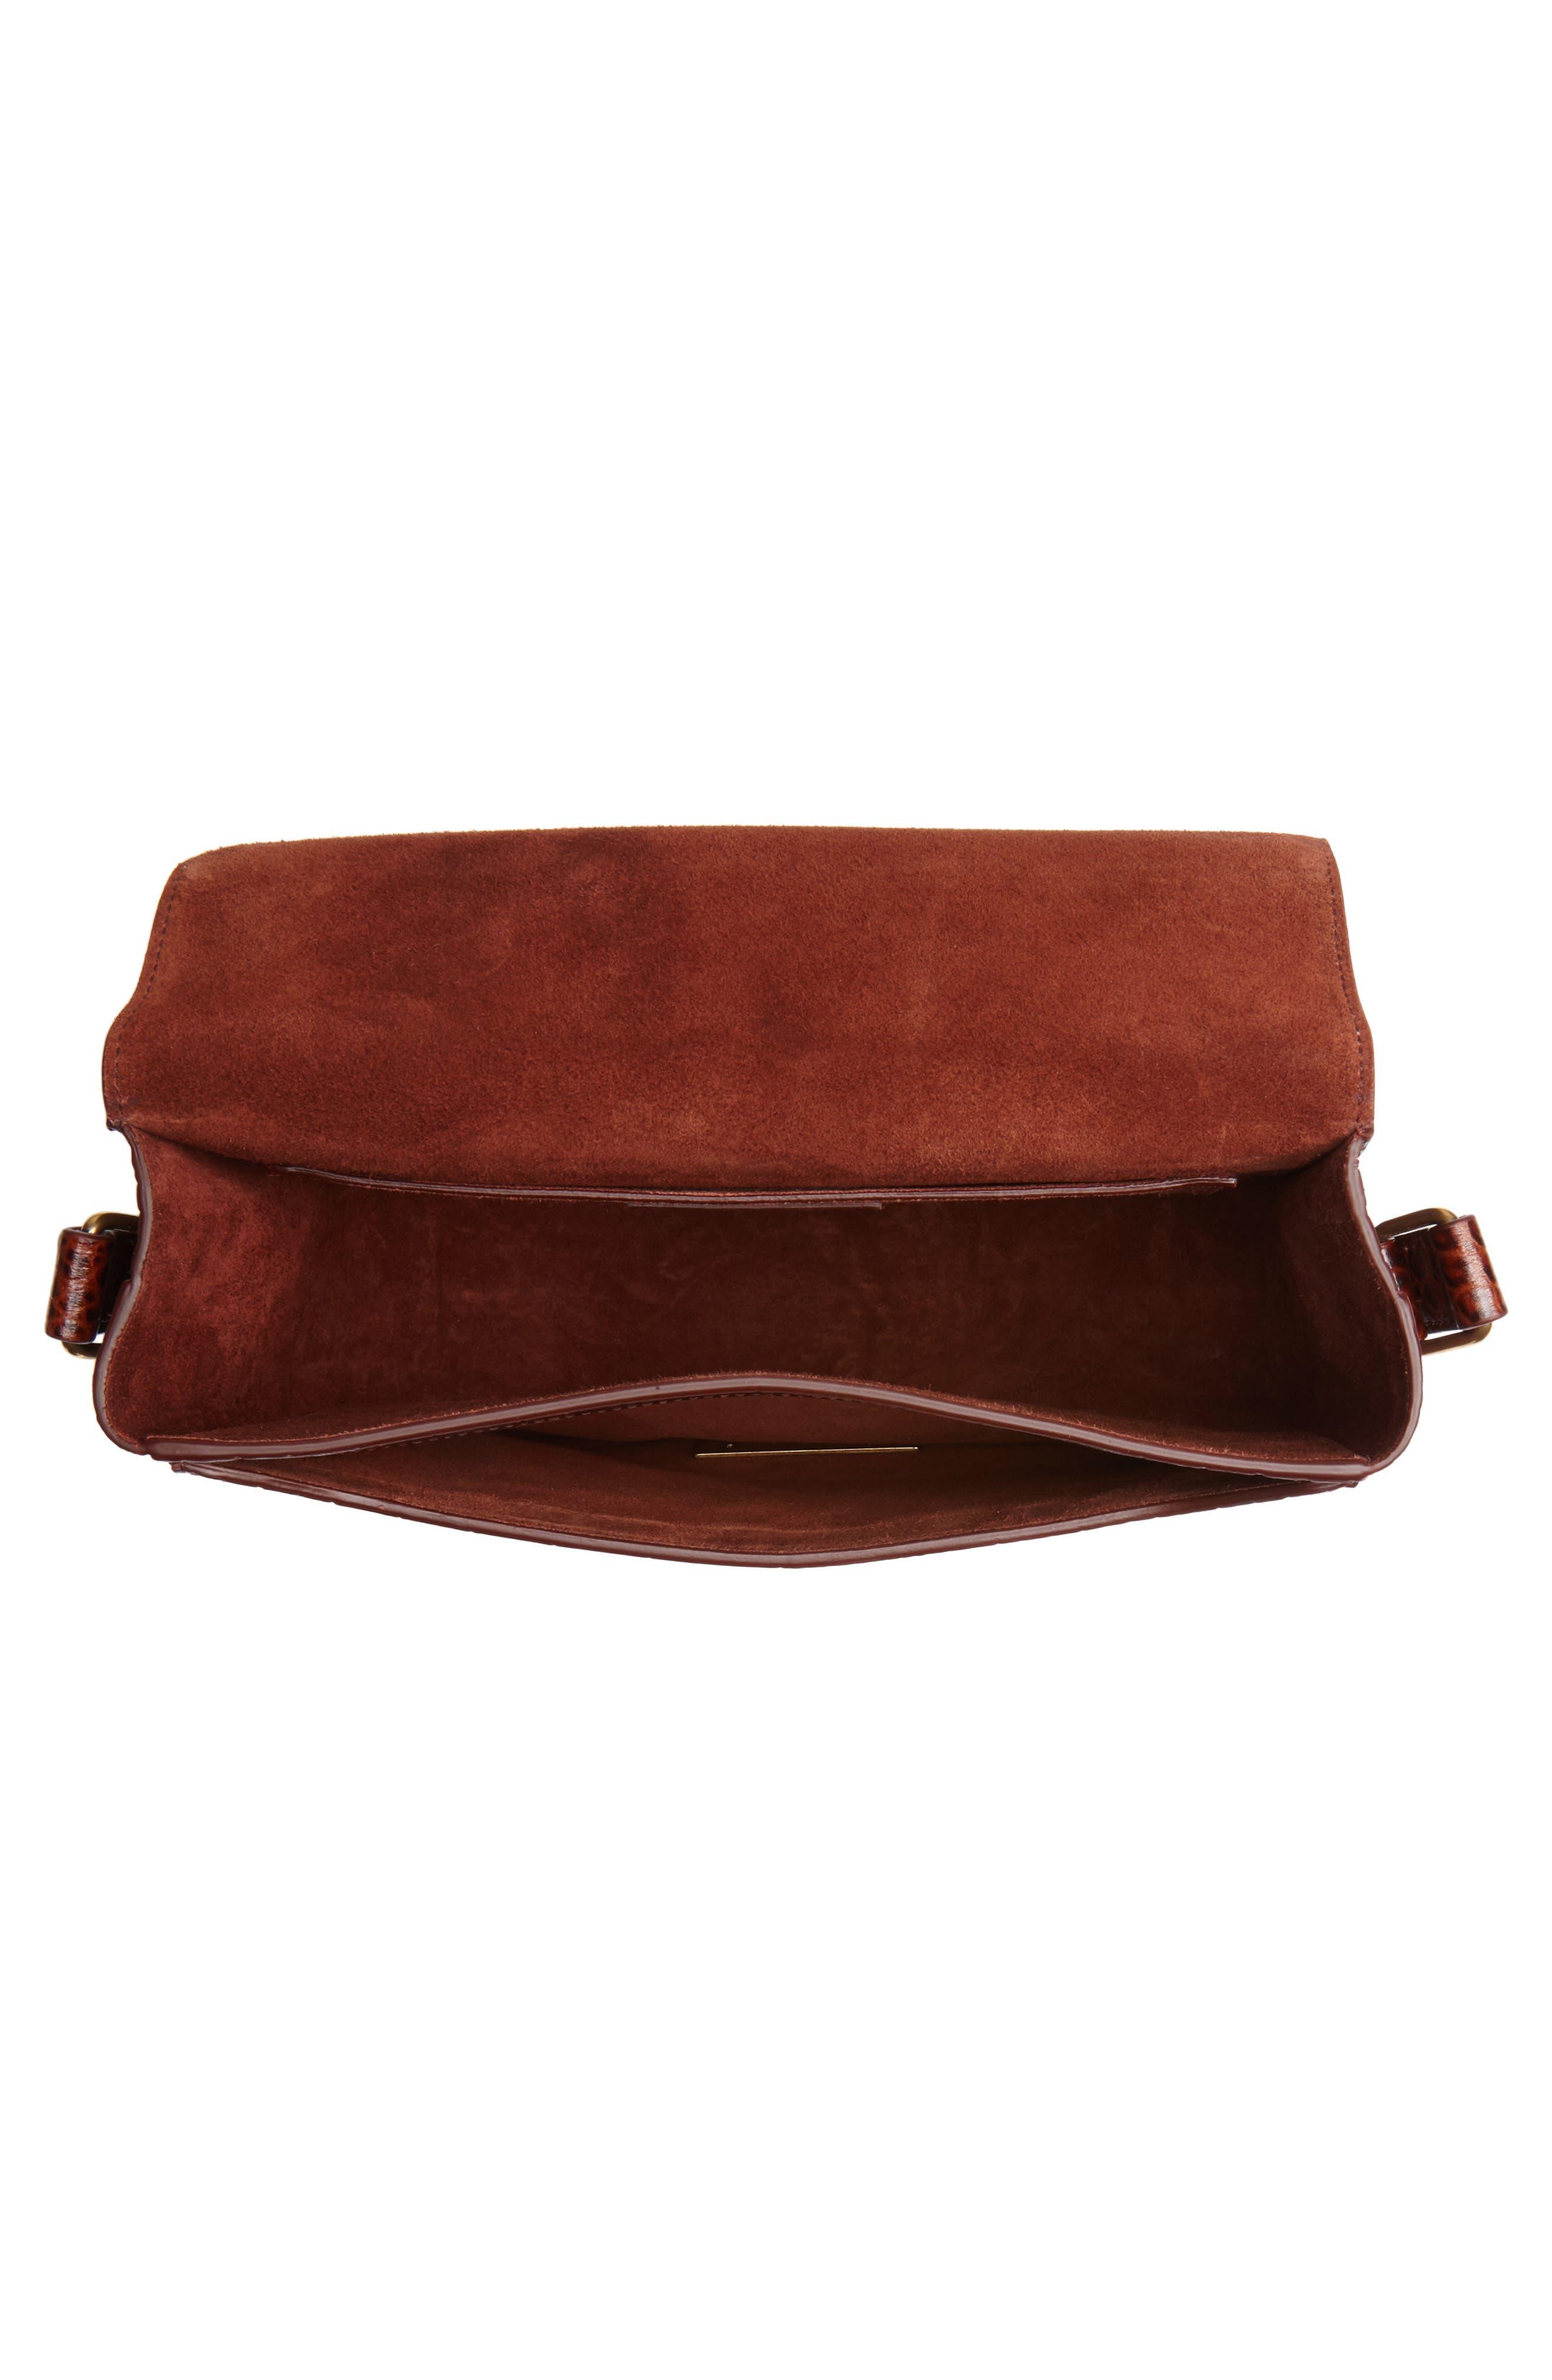 Betty Croc Embossed Leather Shoulder Bag,                             Alternate thumbnail 4, color,                             DARK BLOOD